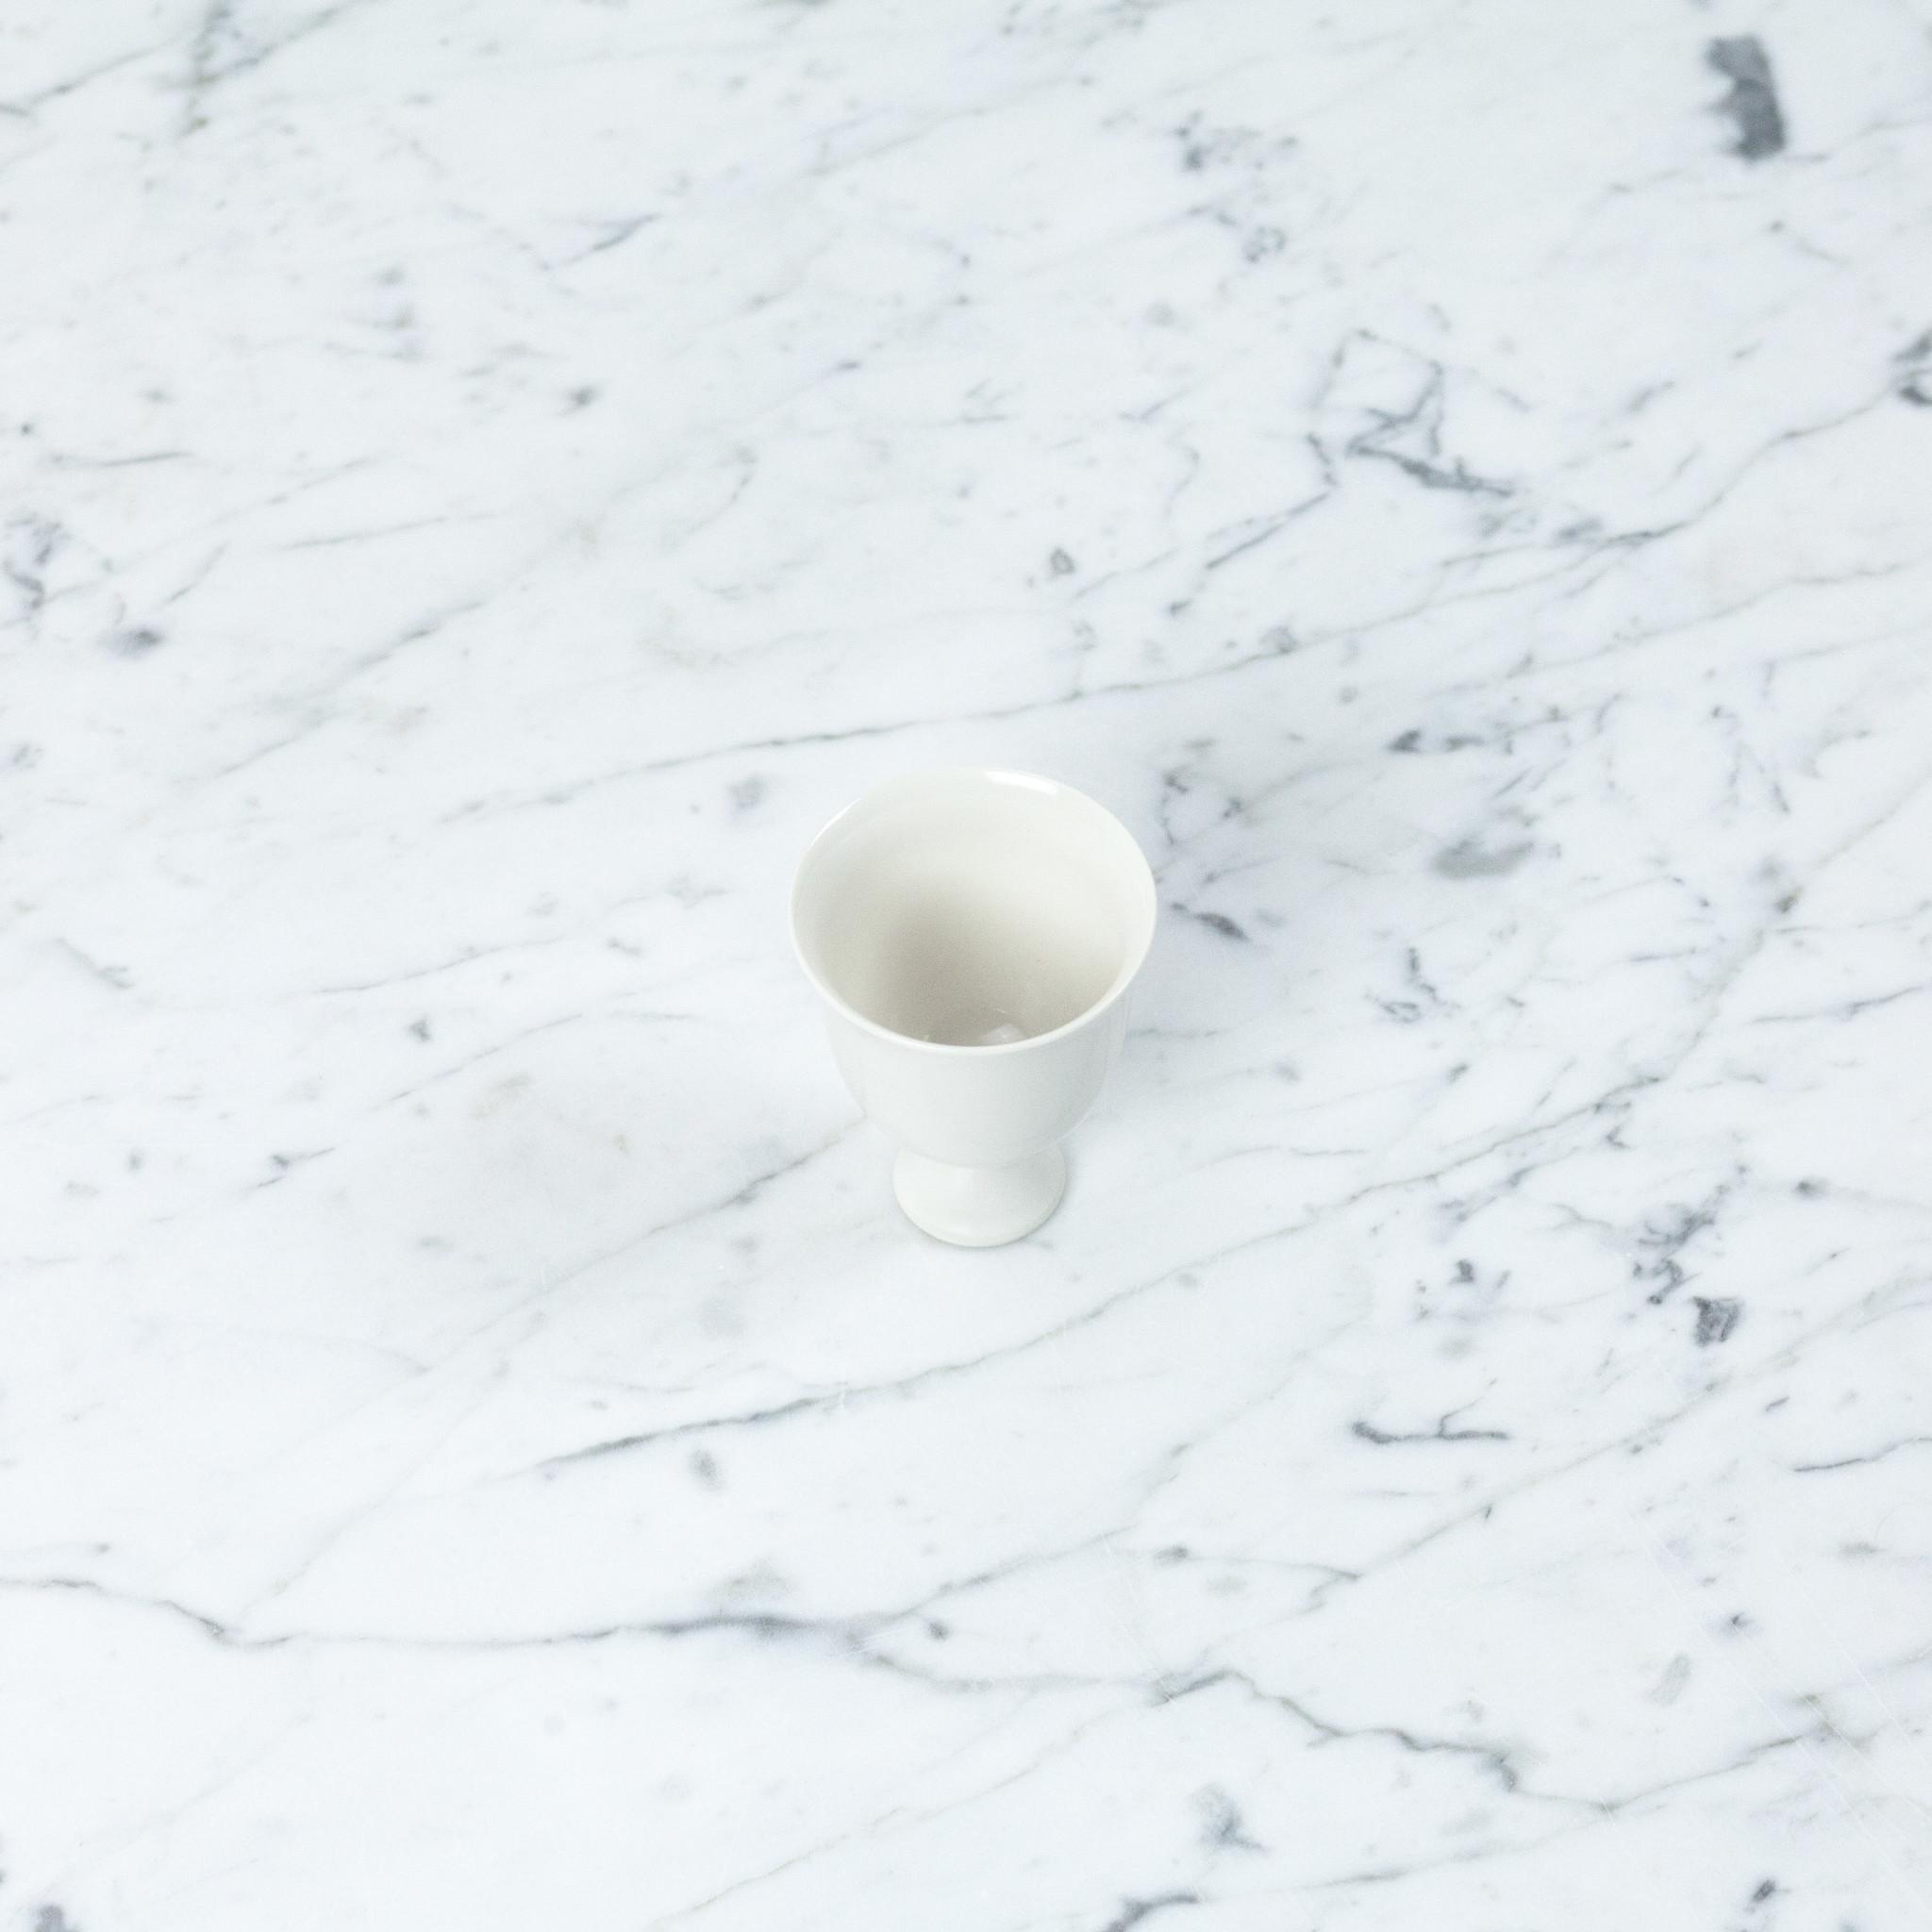 Jicon Porcelain Pedestal Vessel - Tulip Goblet - 2.75''